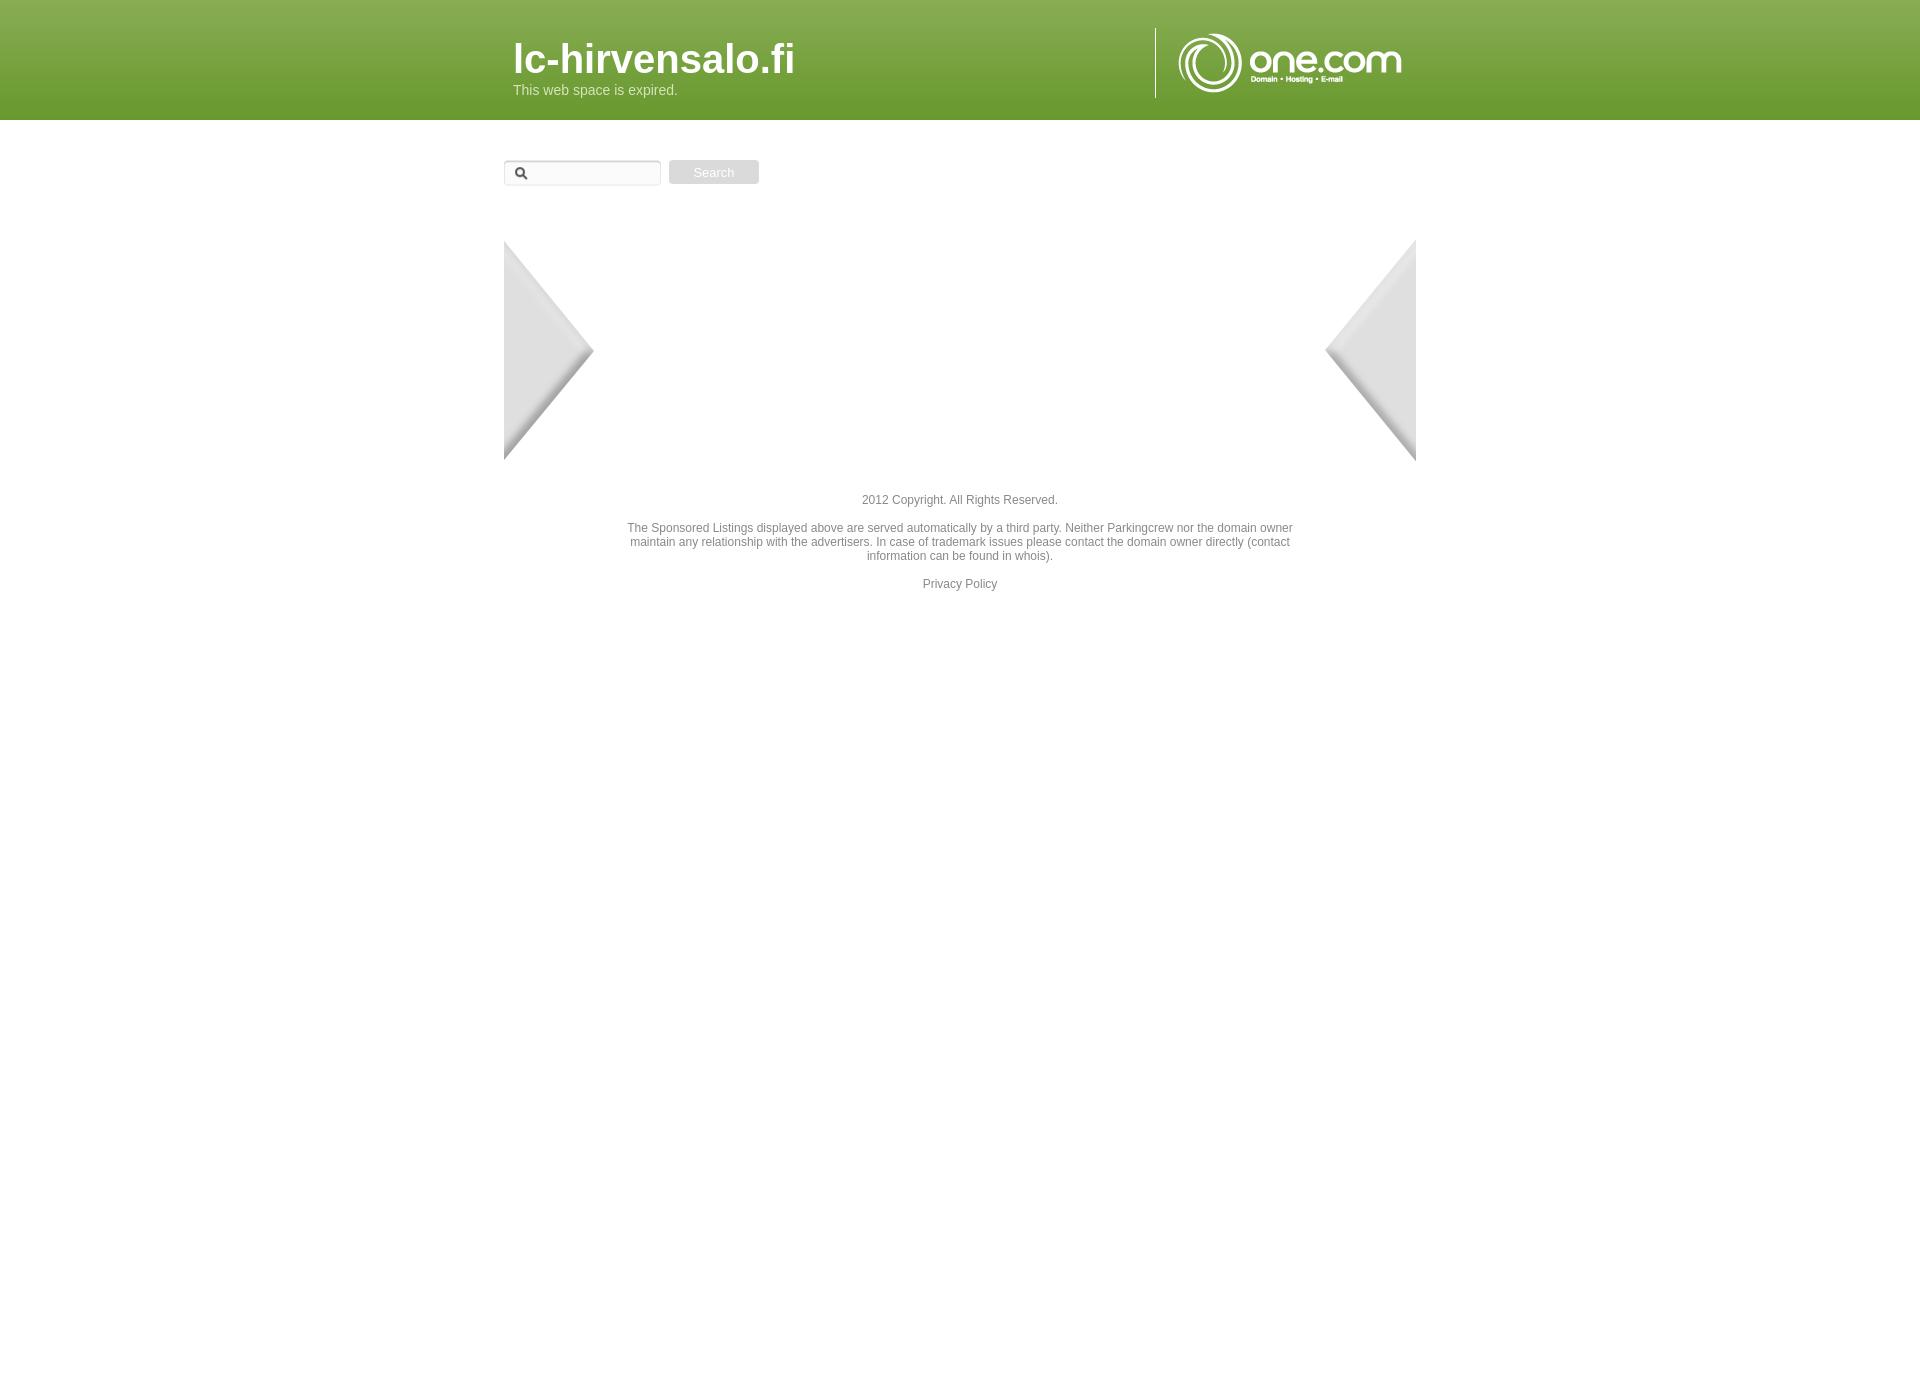 Screenshot for lc-hirvensalo.fi